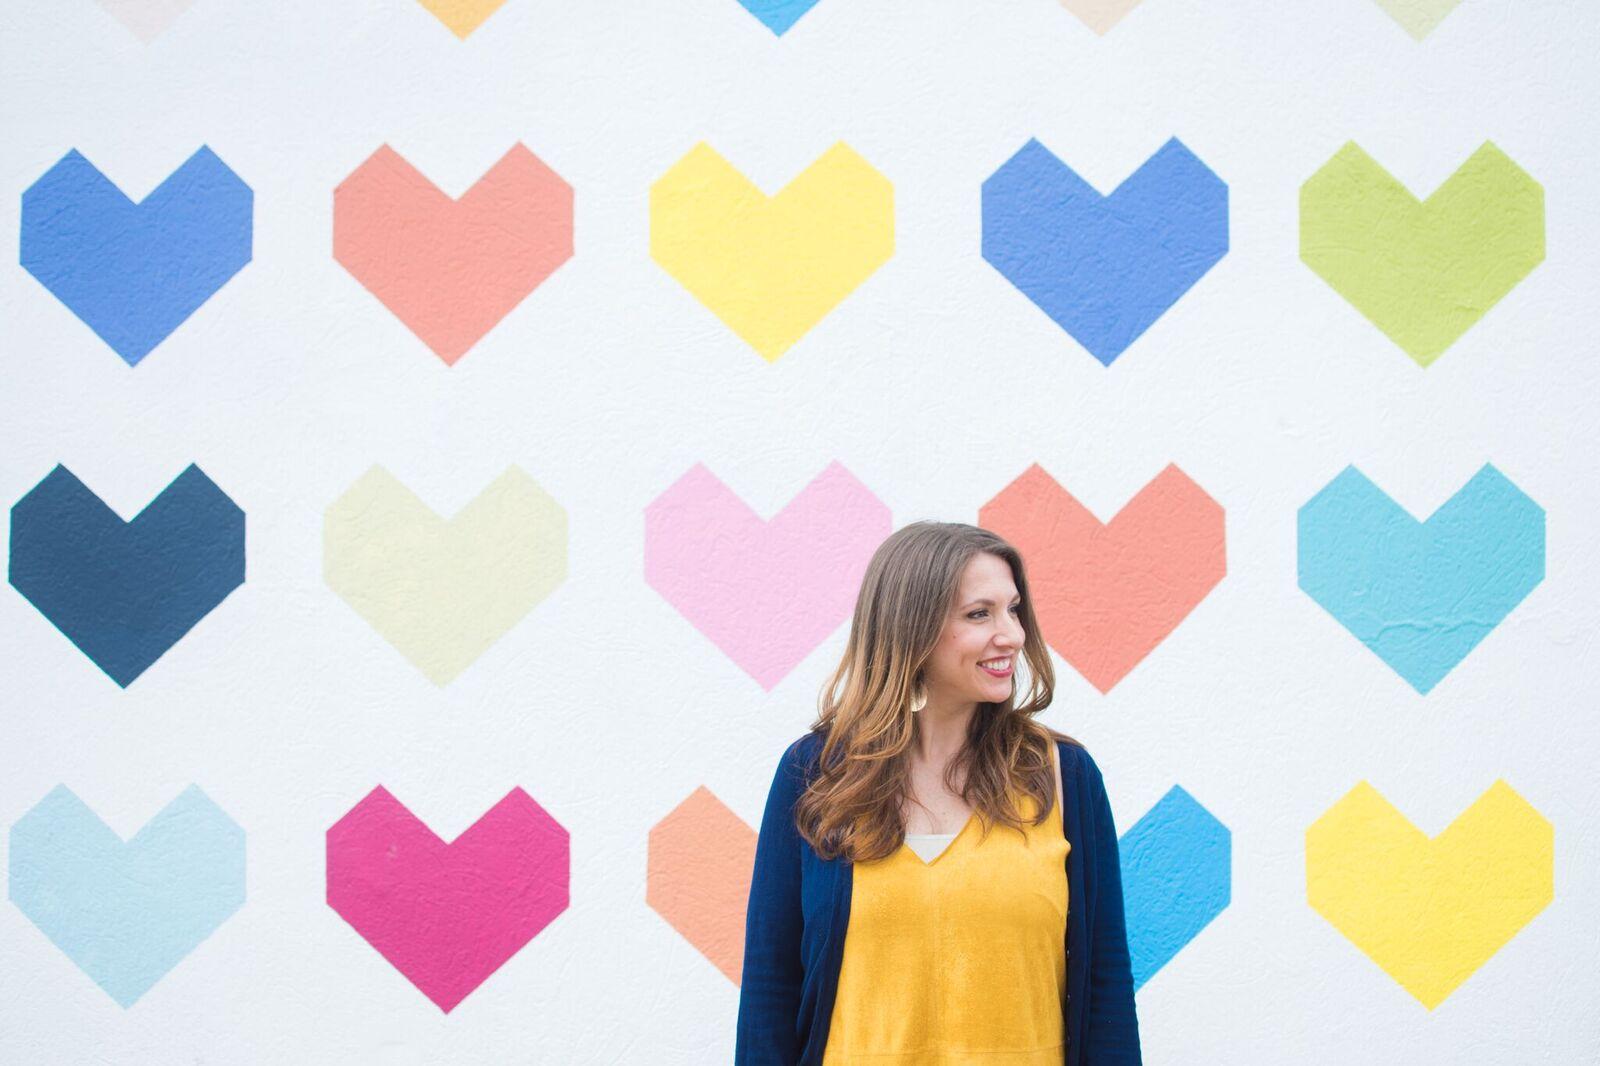 Colorpolitan Sci/Art Personal Color Analysis Dallas TX Rebecca Reid personal color analysis dallas your best colors your wow colors color analysis